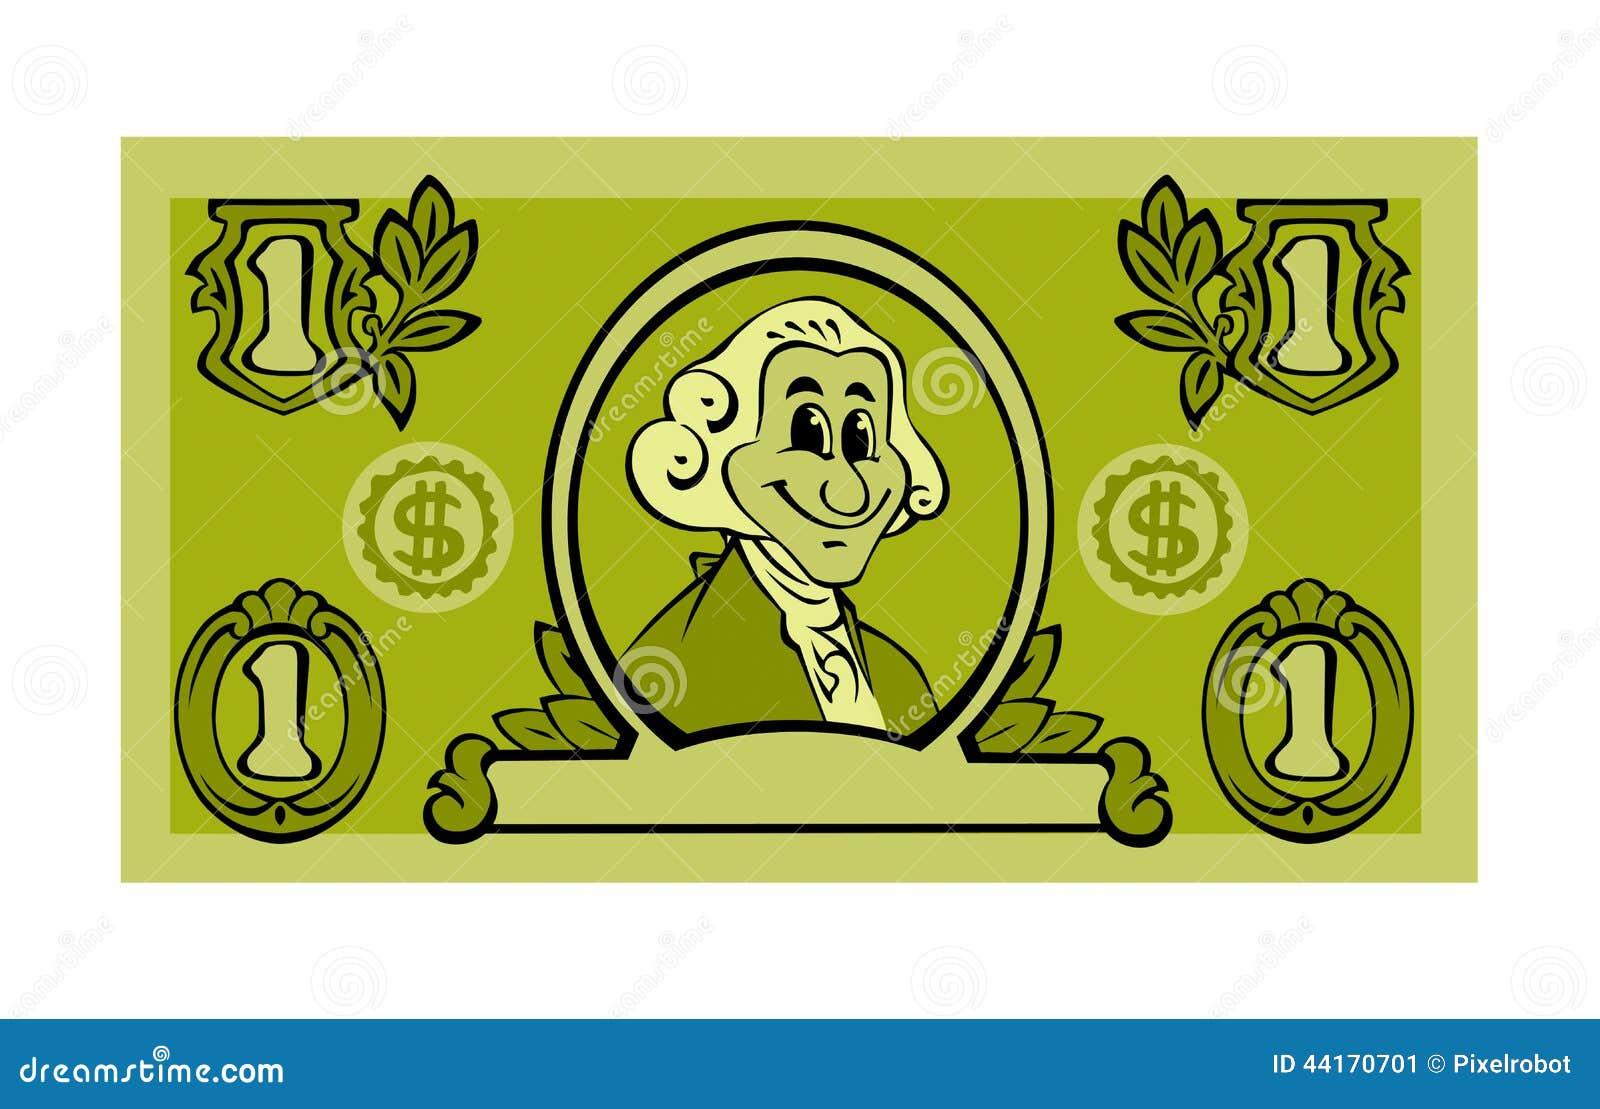 play money stock illustration illustration of federal 44170701 rh dreamstime com Funny Money Clip Art Money Border Clip Art